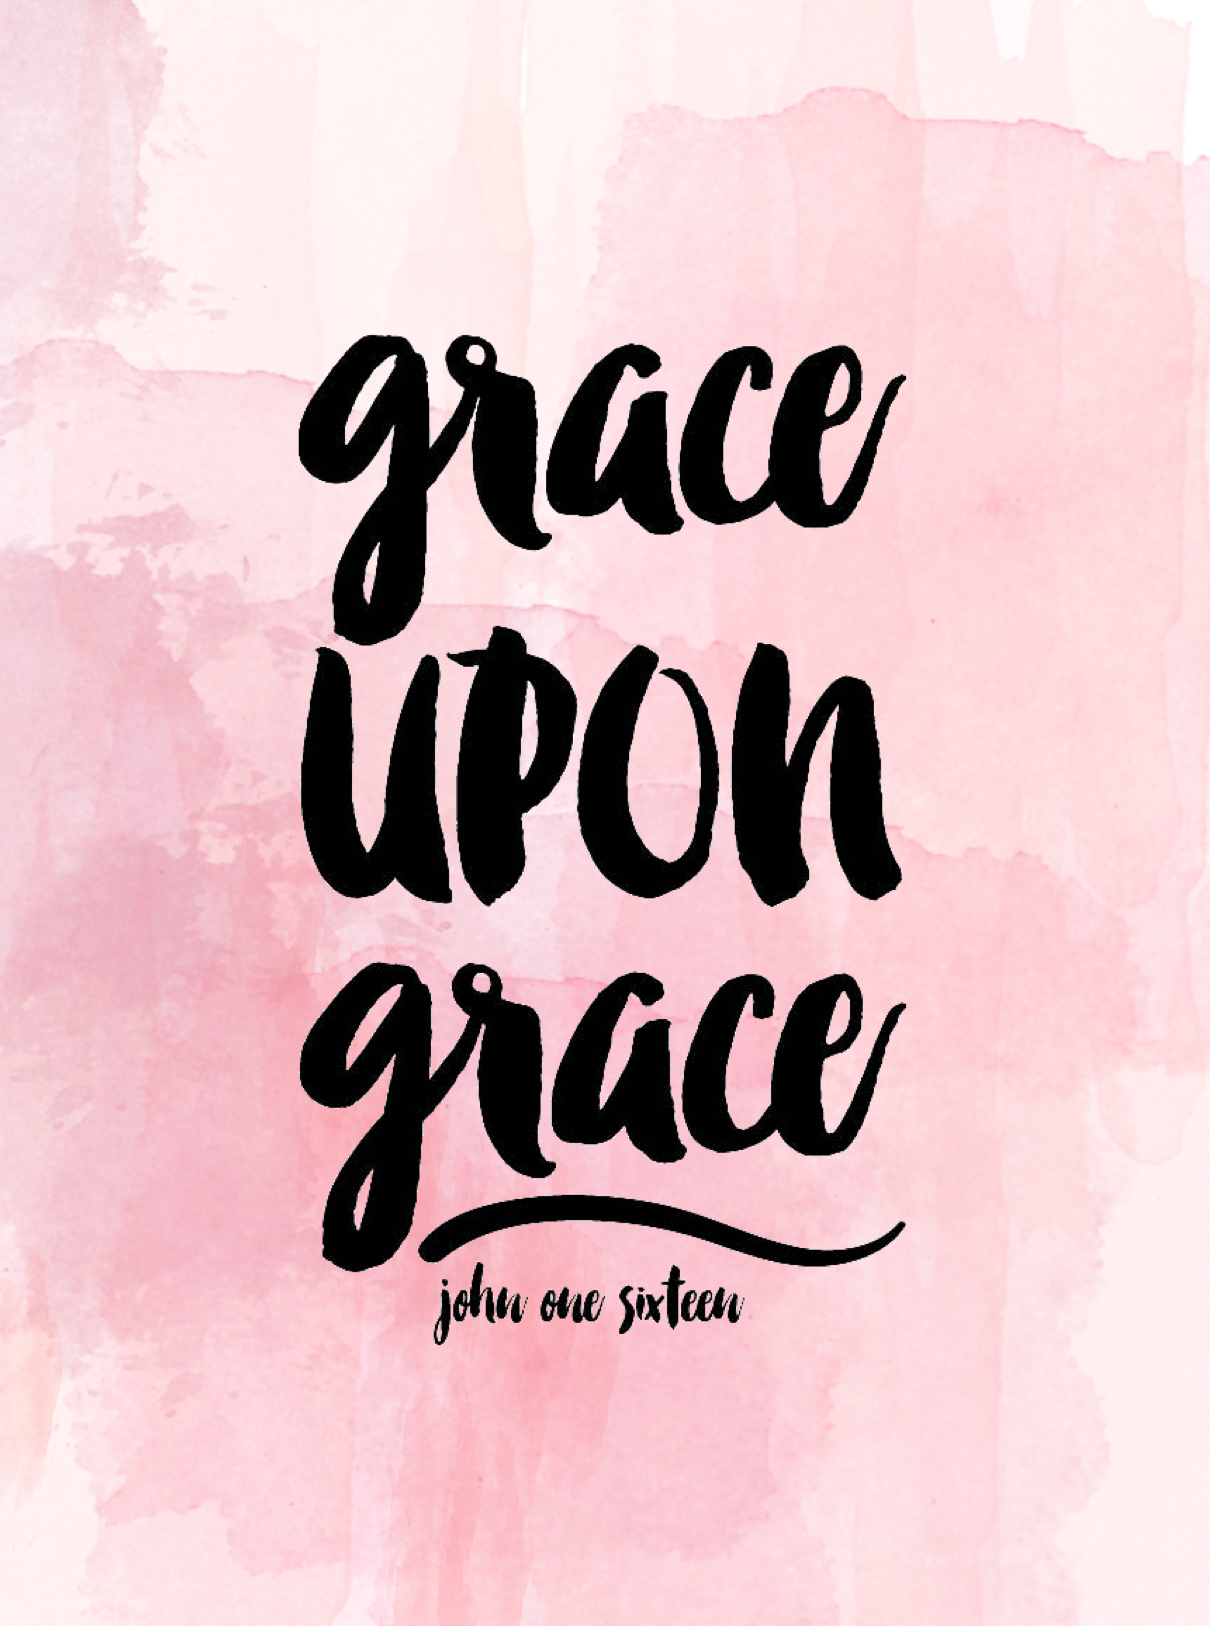 Grace Upon John 116 Wallpaper